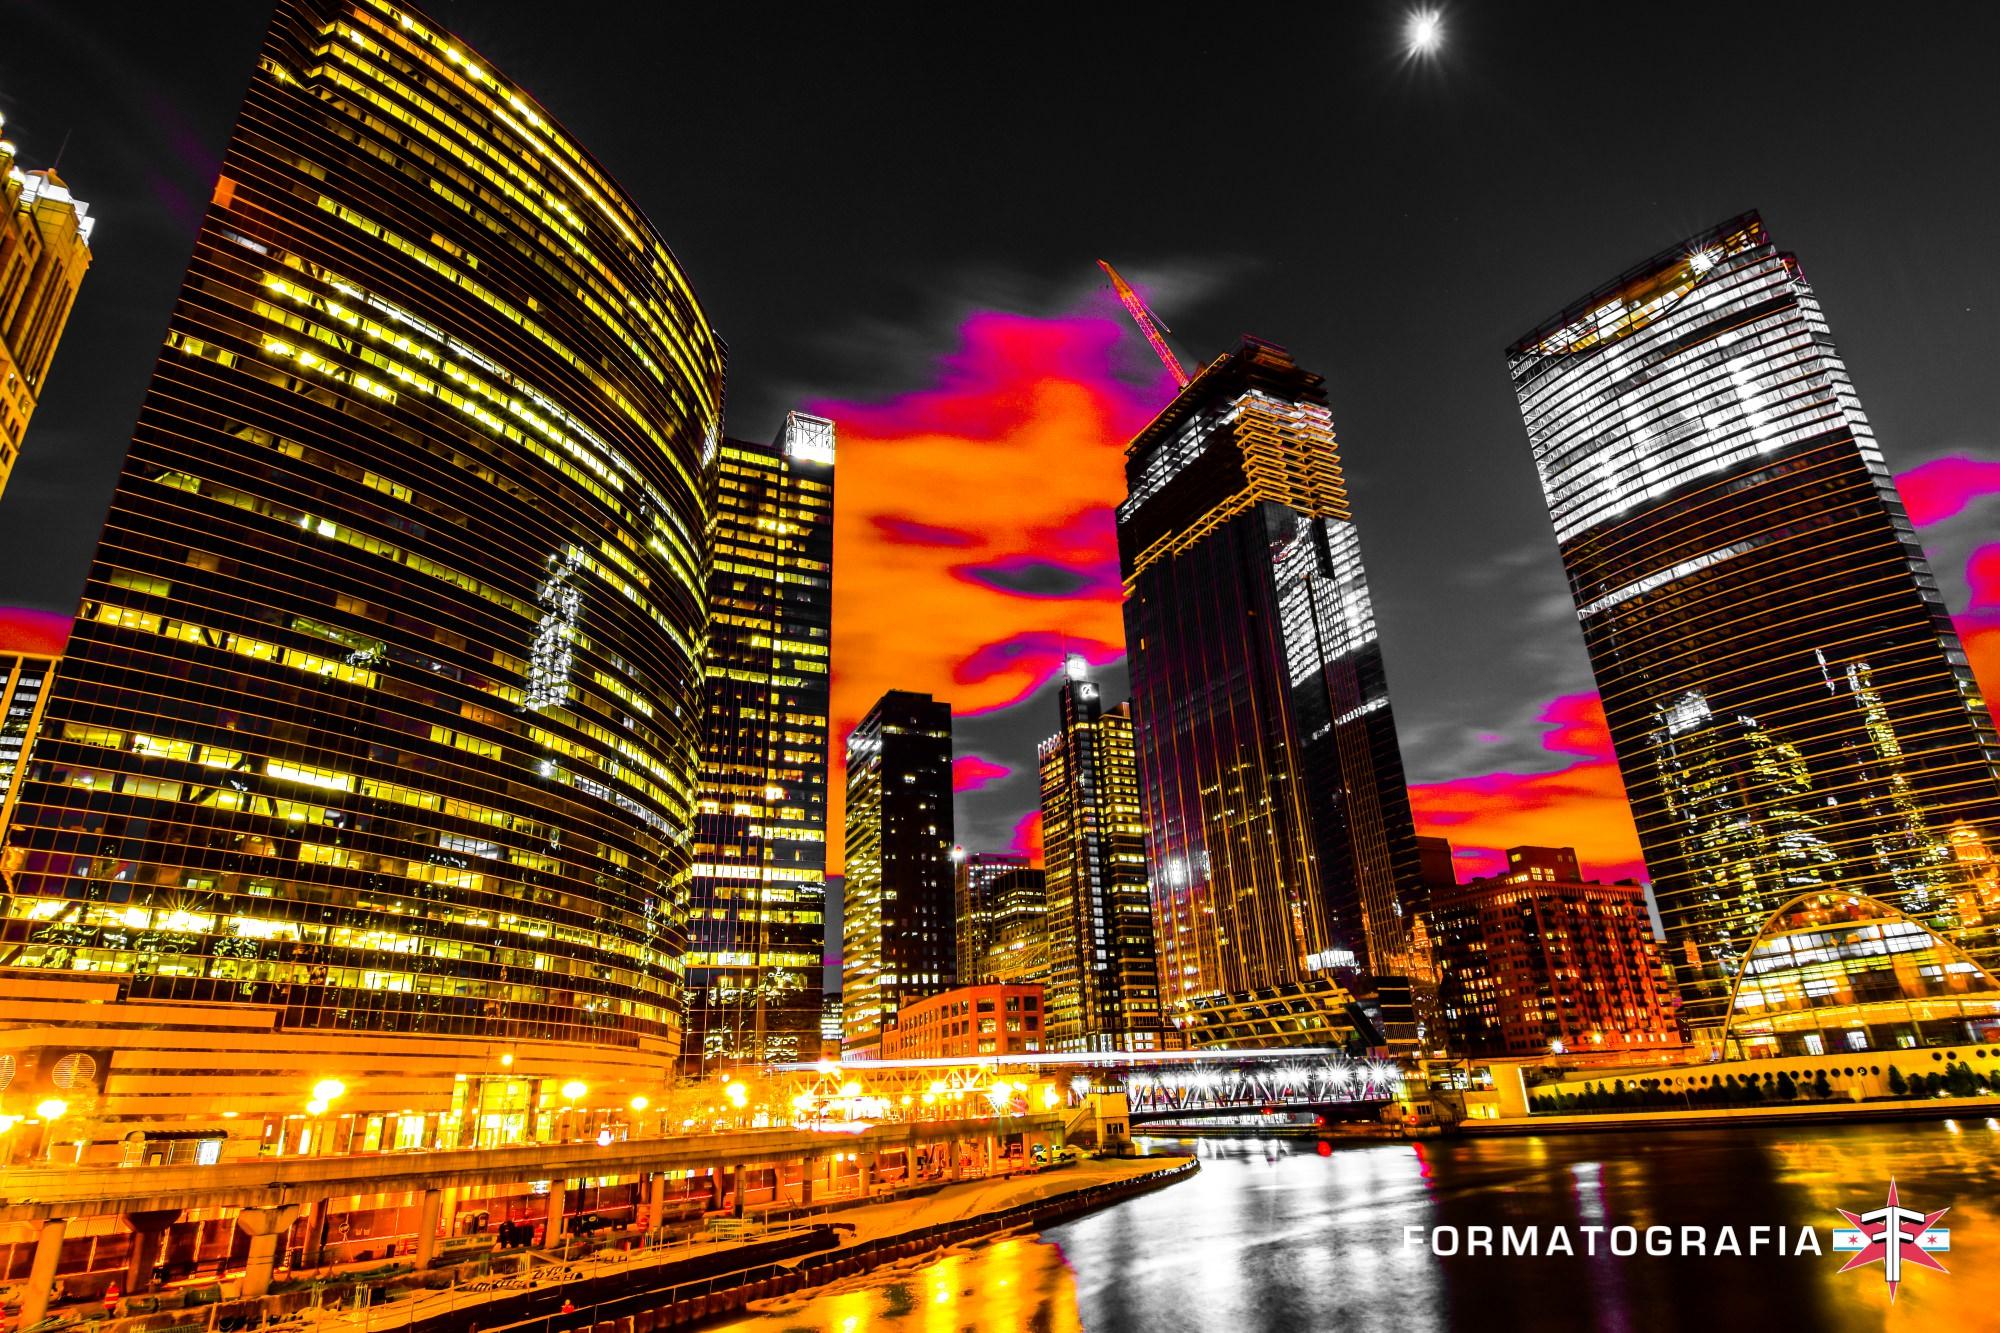 eric formato chicago photographer fall update city architecture shotsDSC_0083-3.jpg